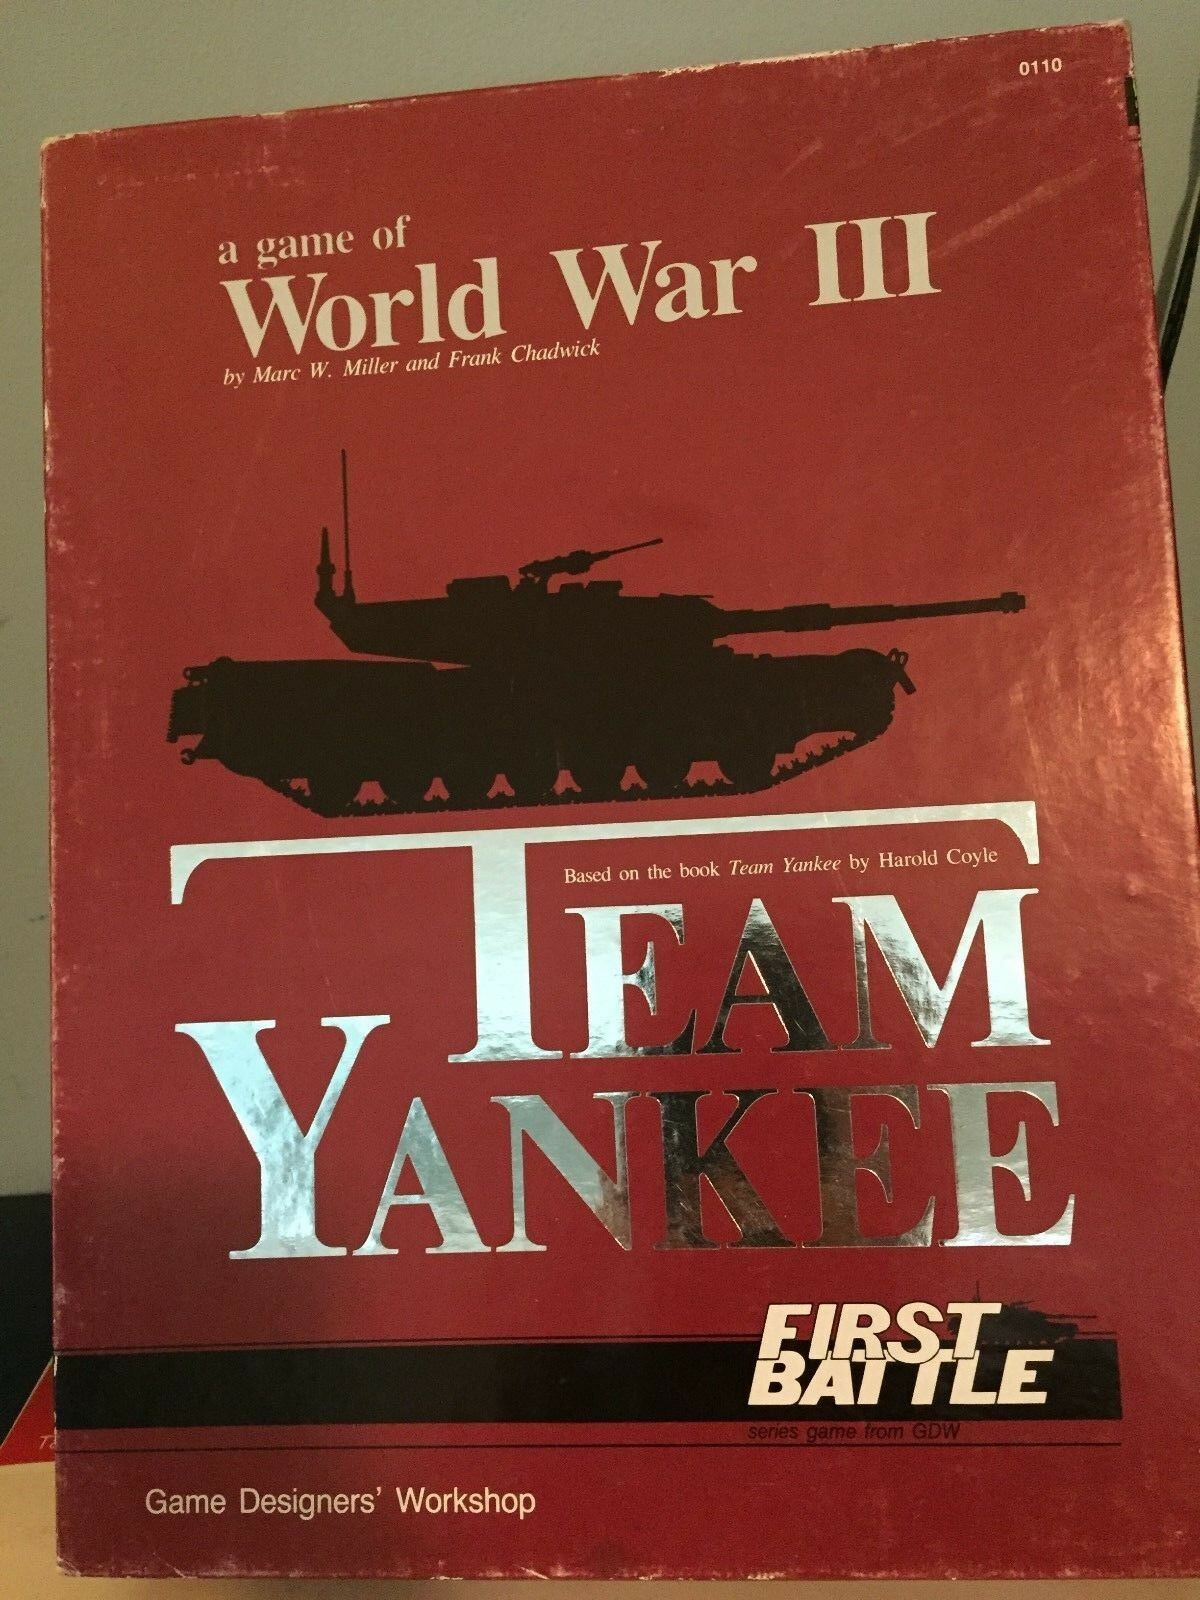 1987 WORLD WAR III TEAM YANKEE FIRST BATTLE GDW COMPLETE WAR GAME